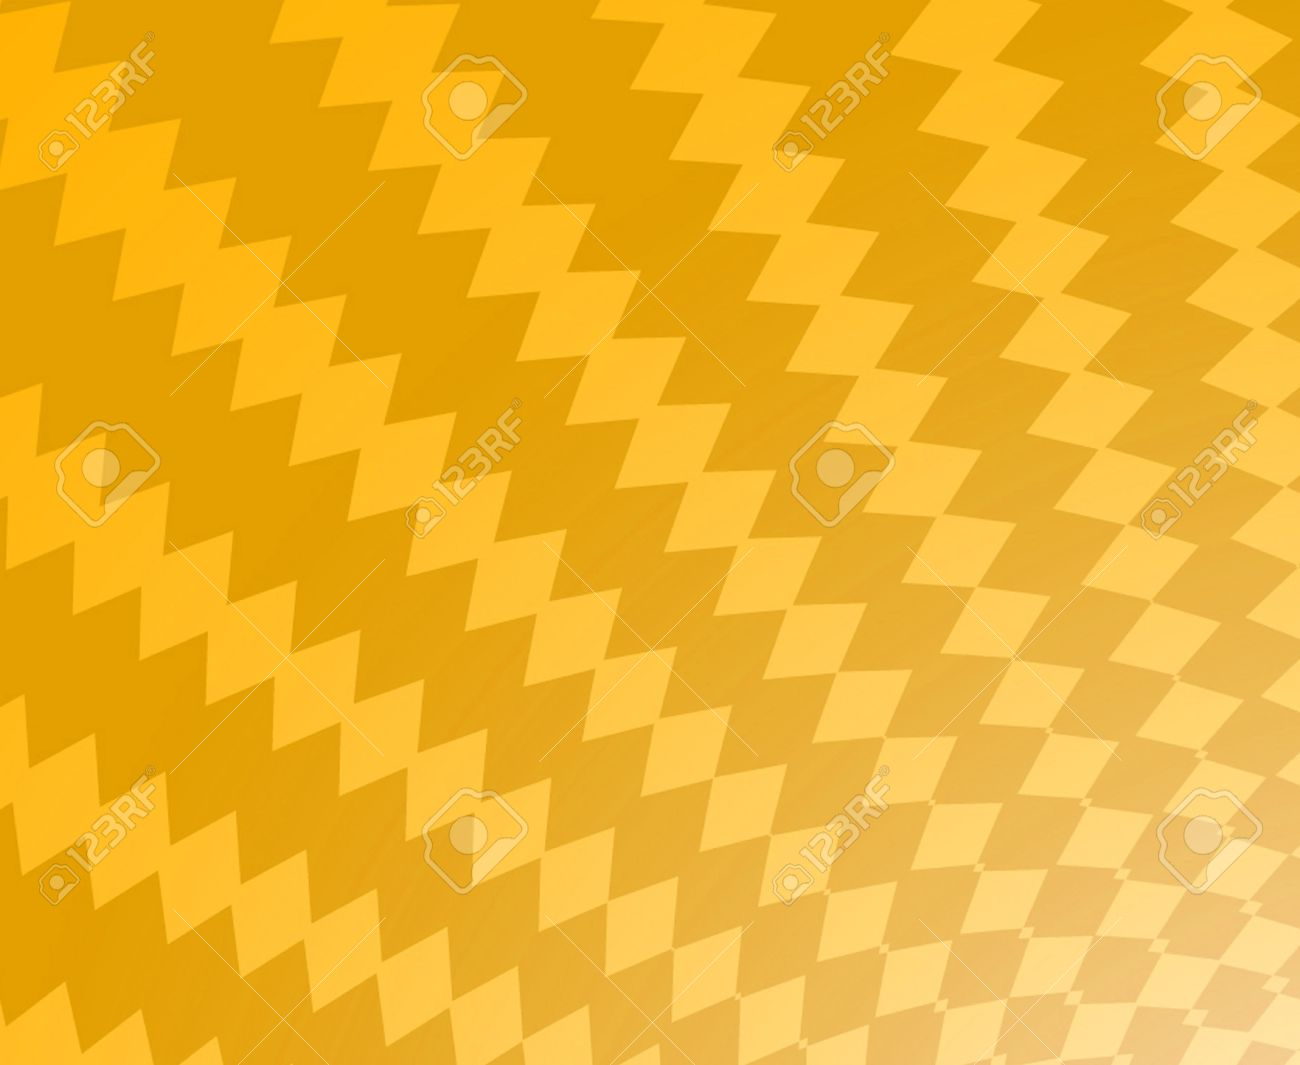 Yellow Diamonds Background yellow diamond background